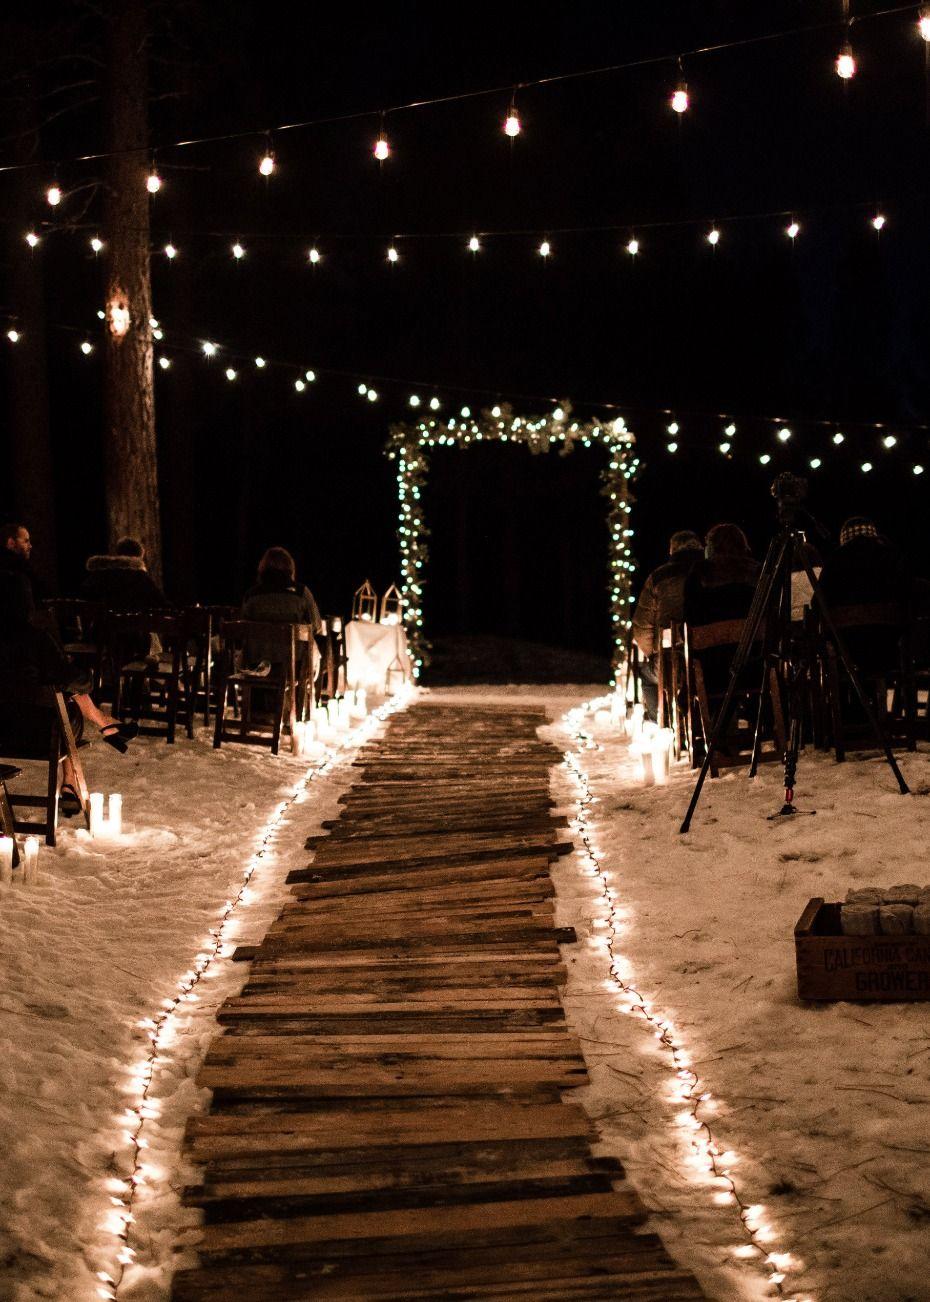 A Wintry New Years Eve Wedding Under The Stars Wedding Lights